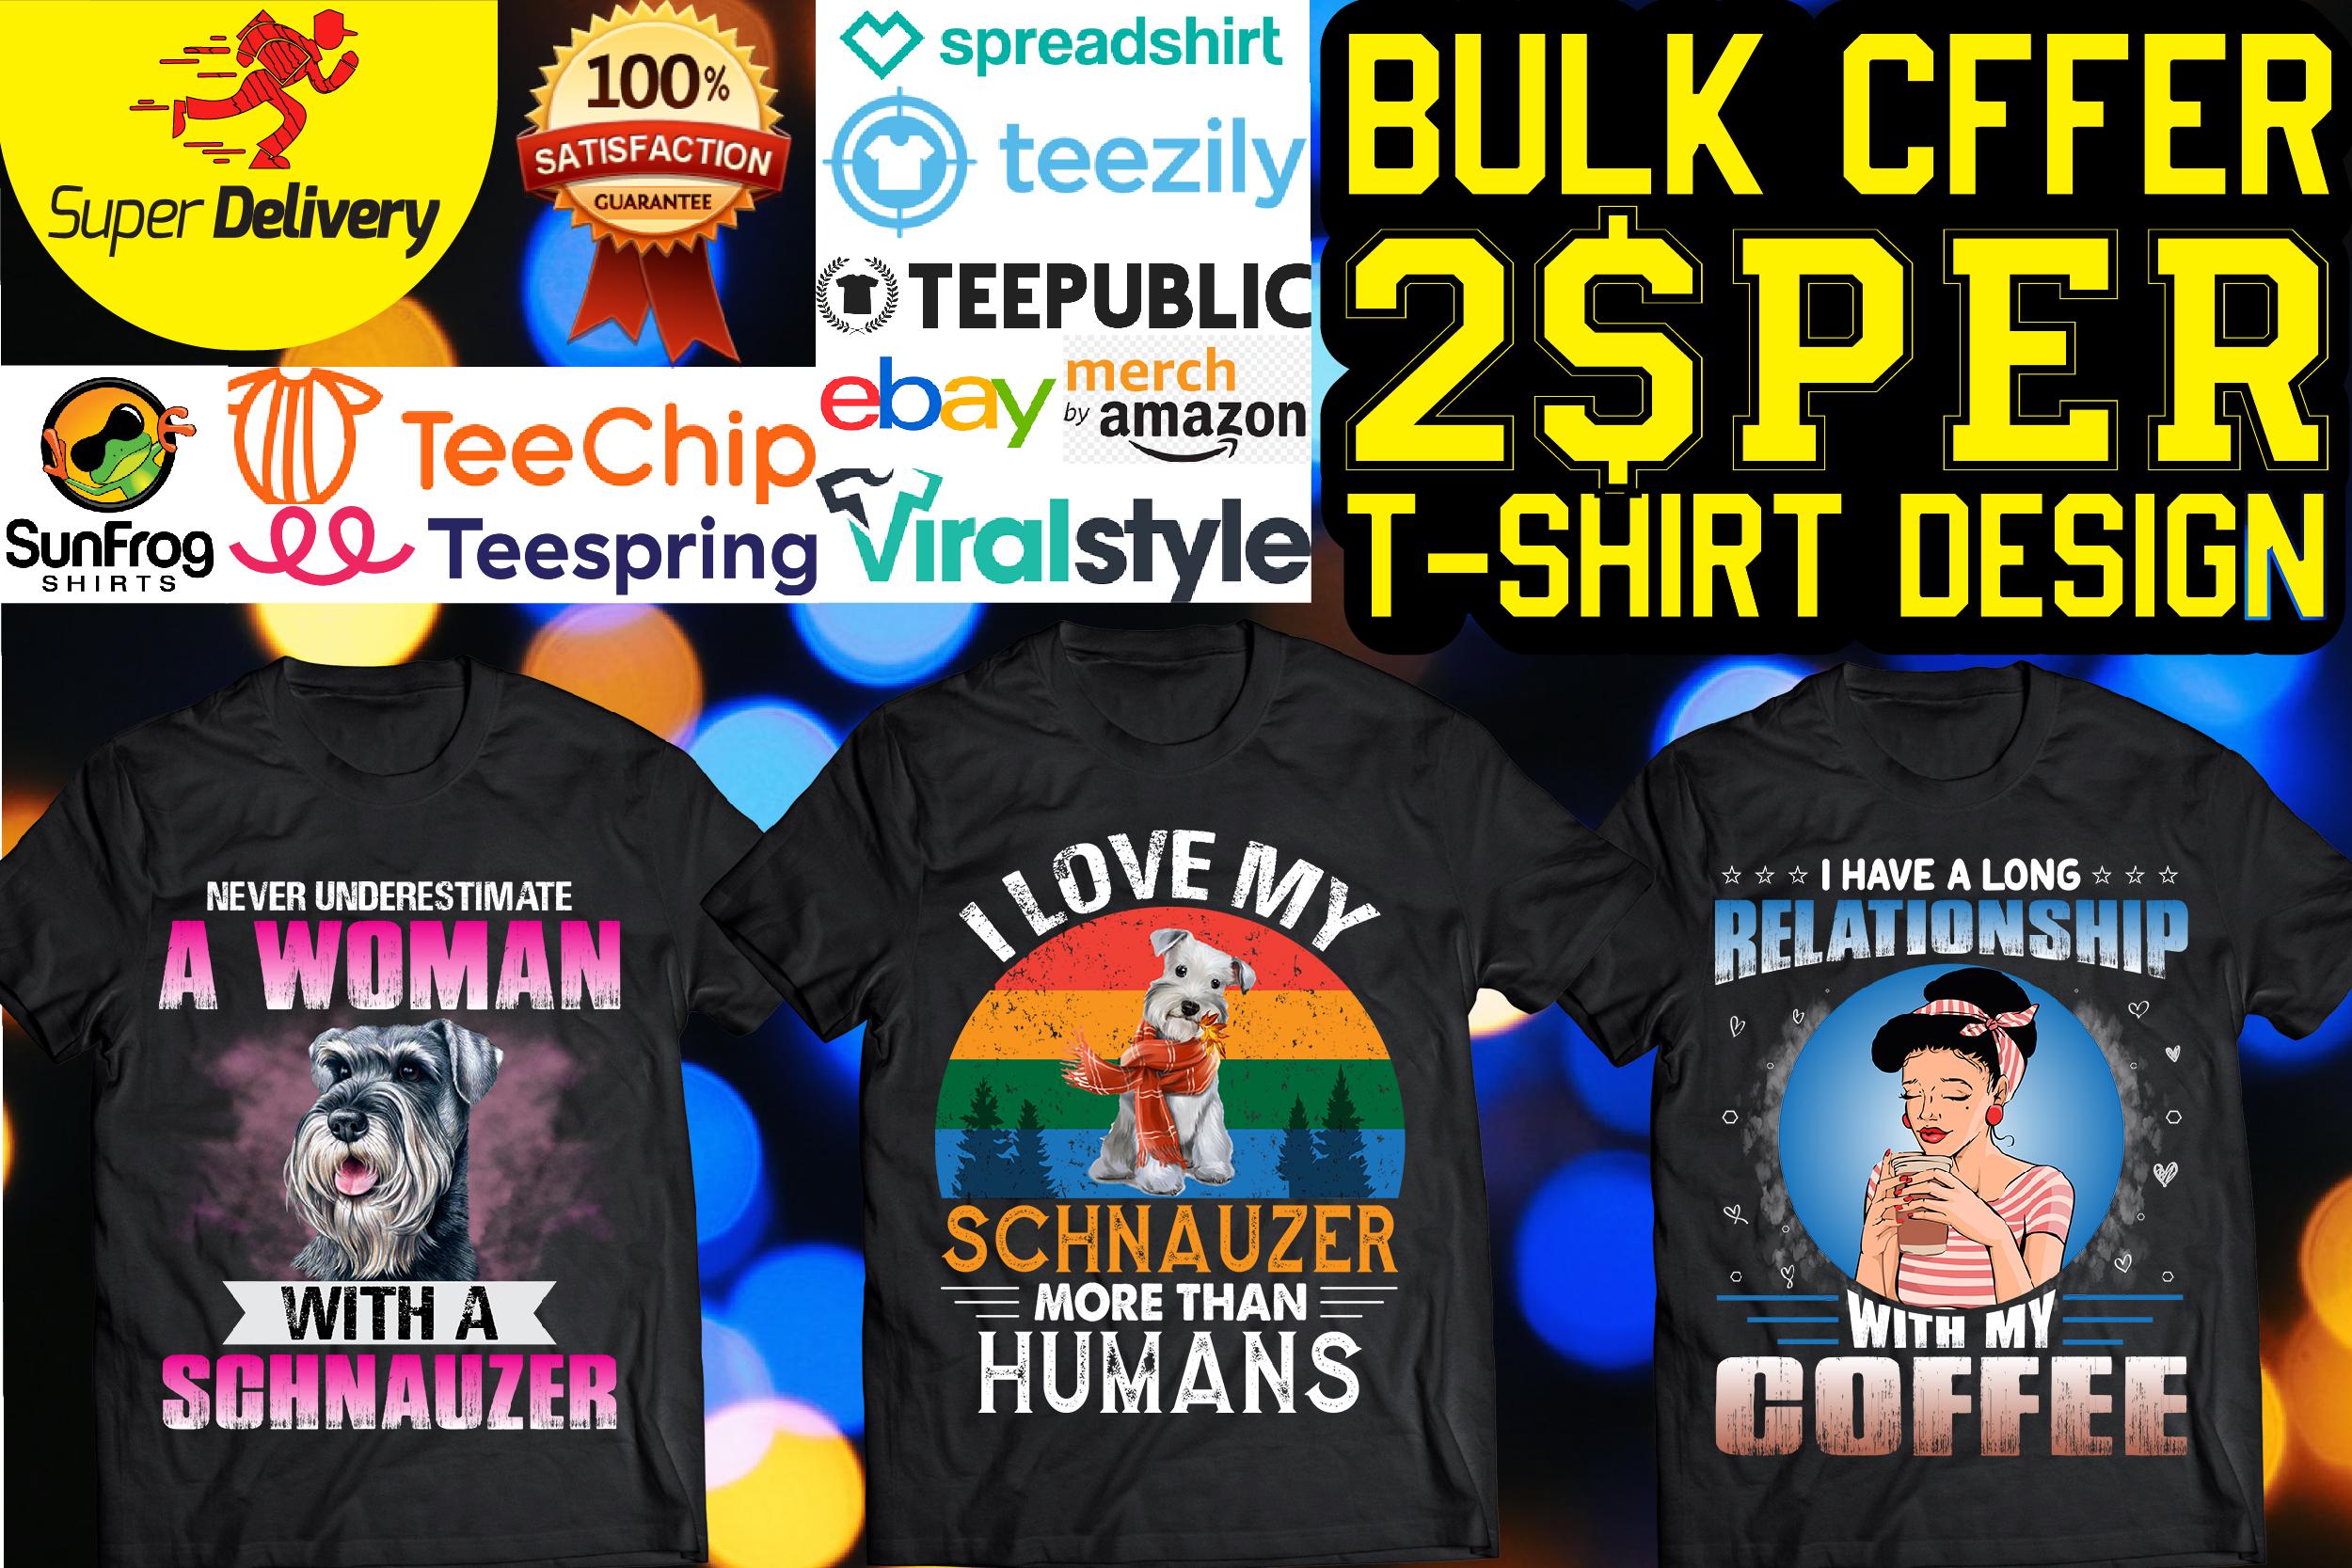 I will do trendy custom t shirt design and bulk t shirt designs